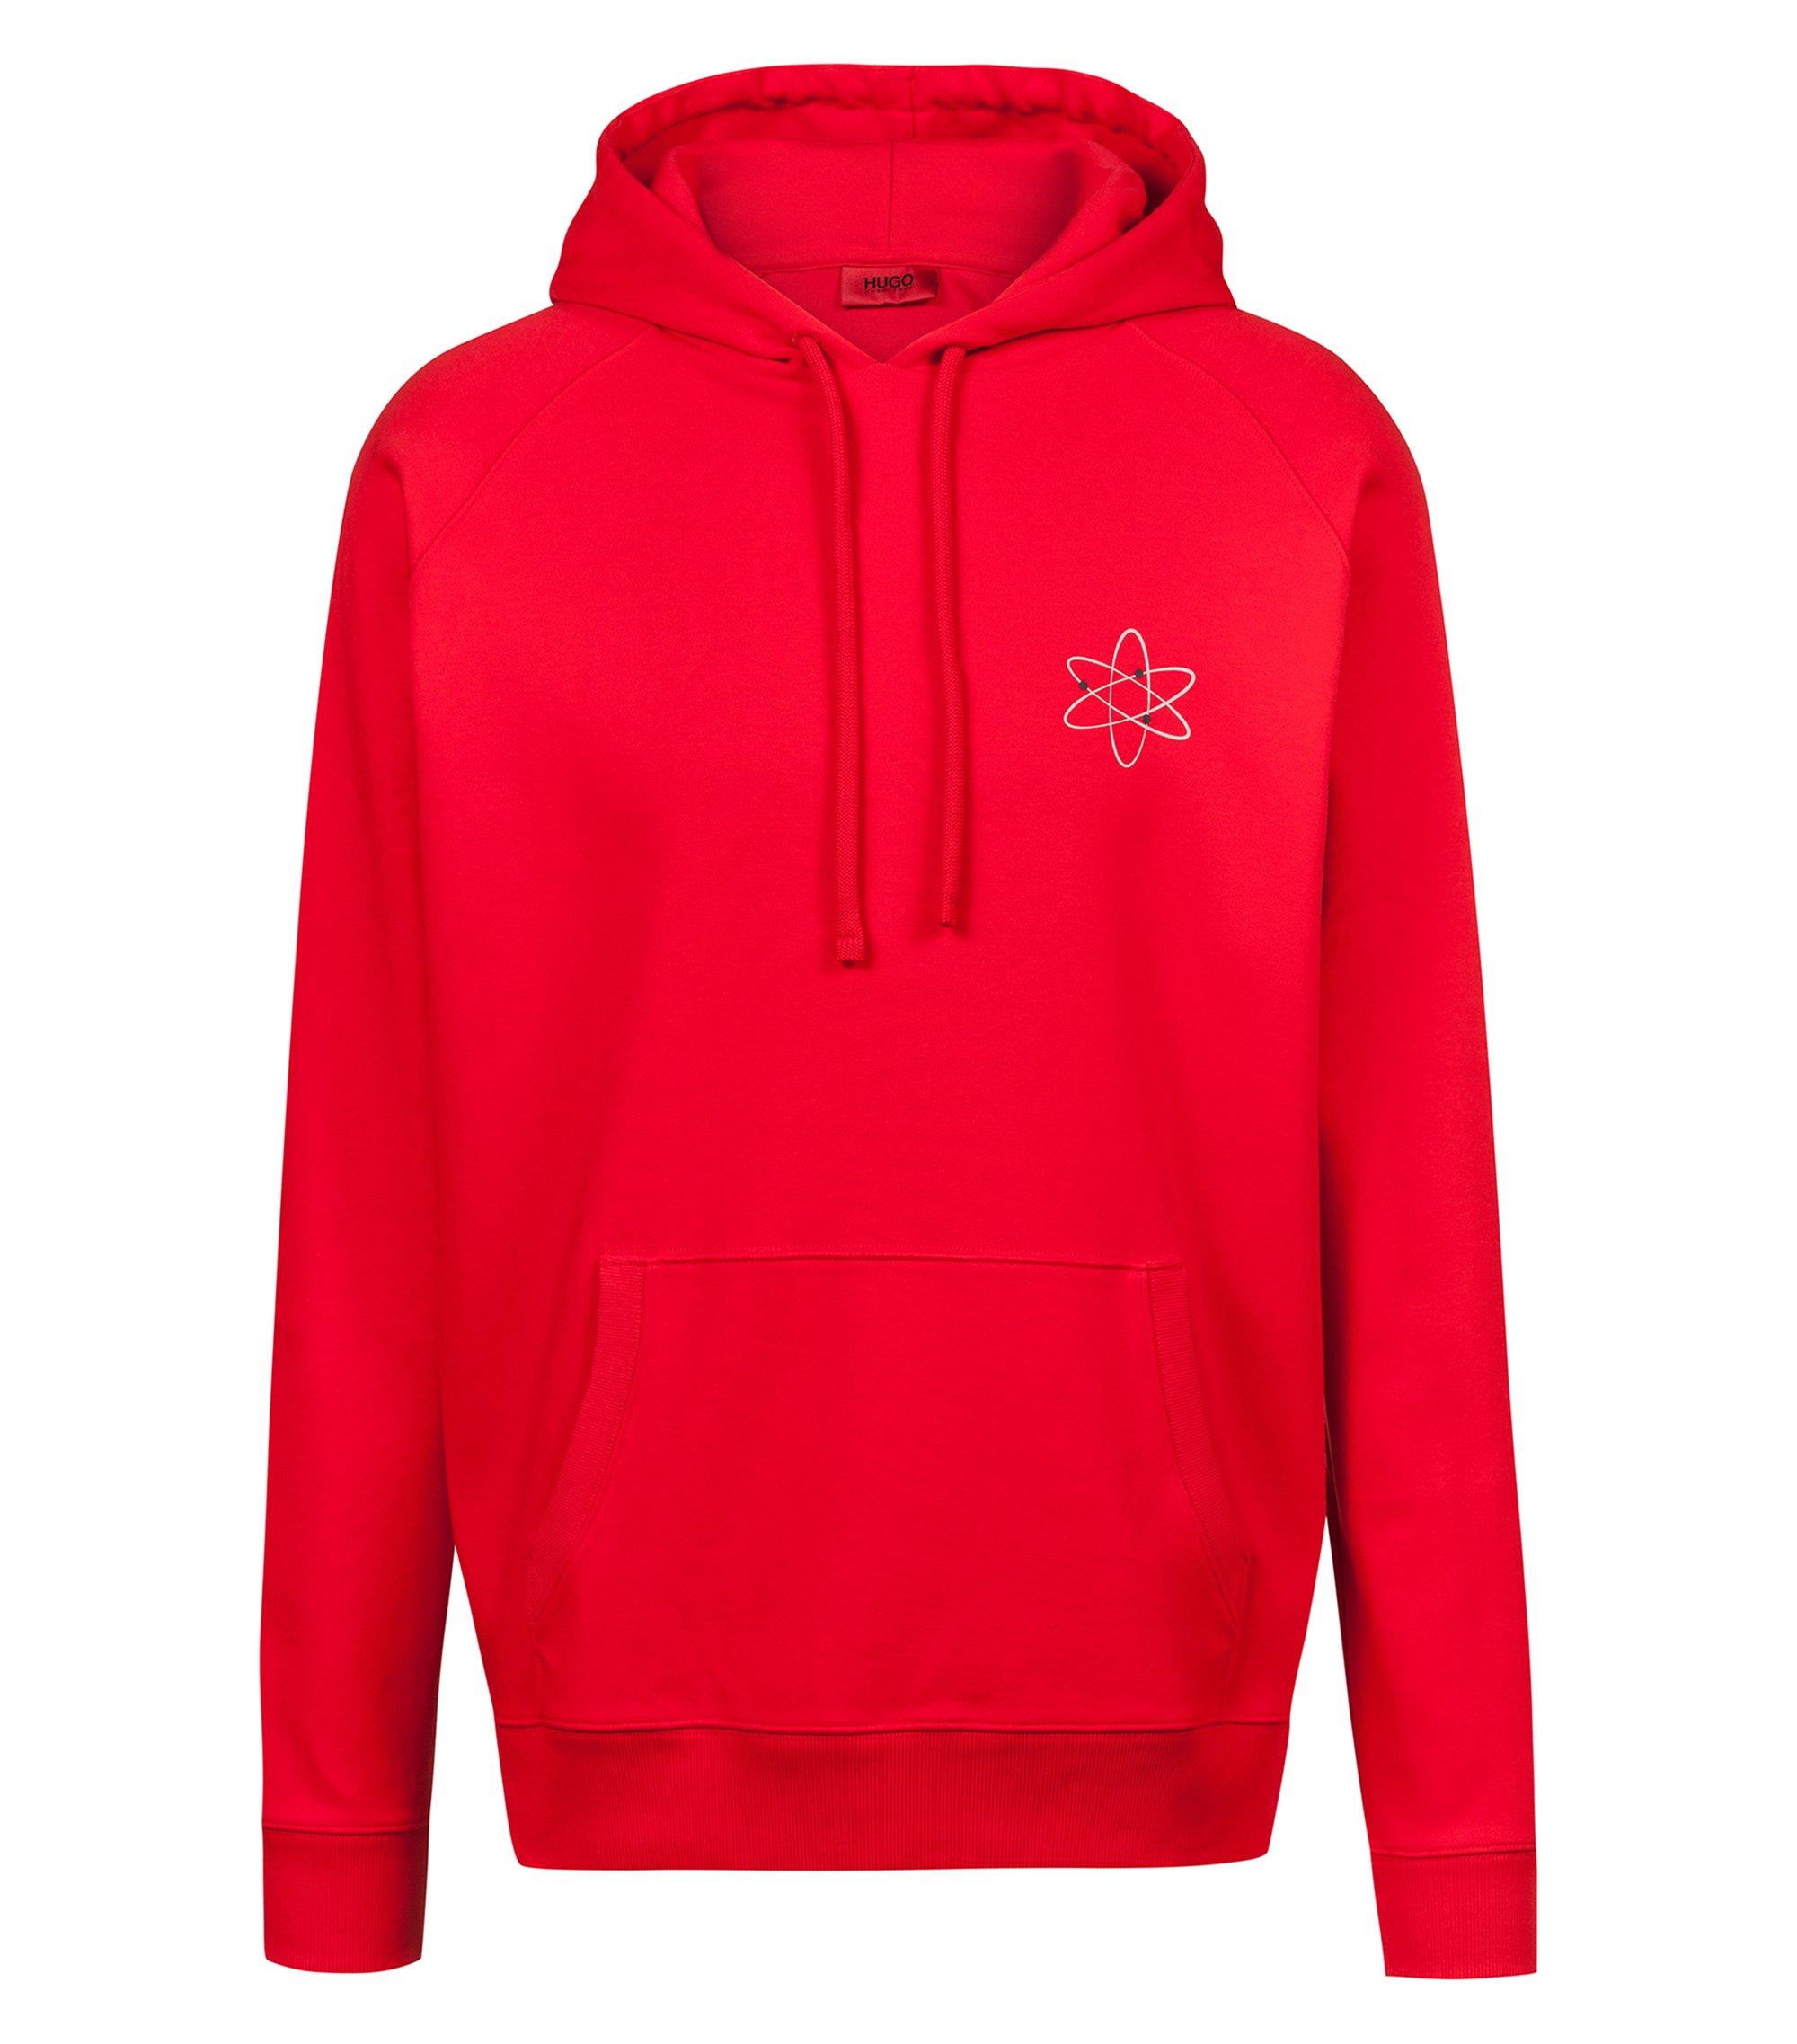 Kapuzen-Sweatshirt mit Atom-Print und Reversed-Logo, Rot